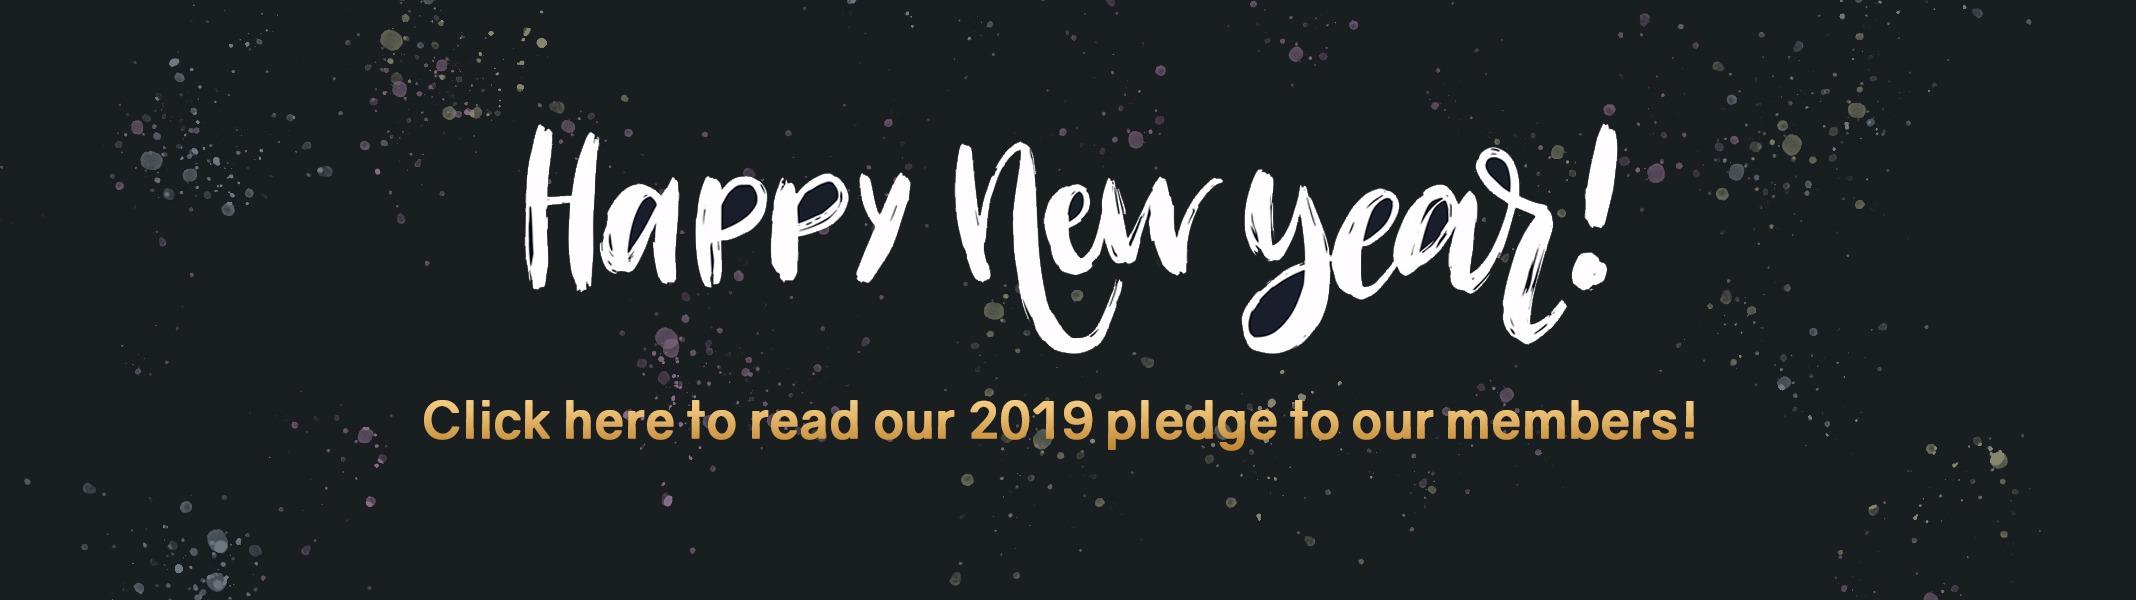 New Year Pledge